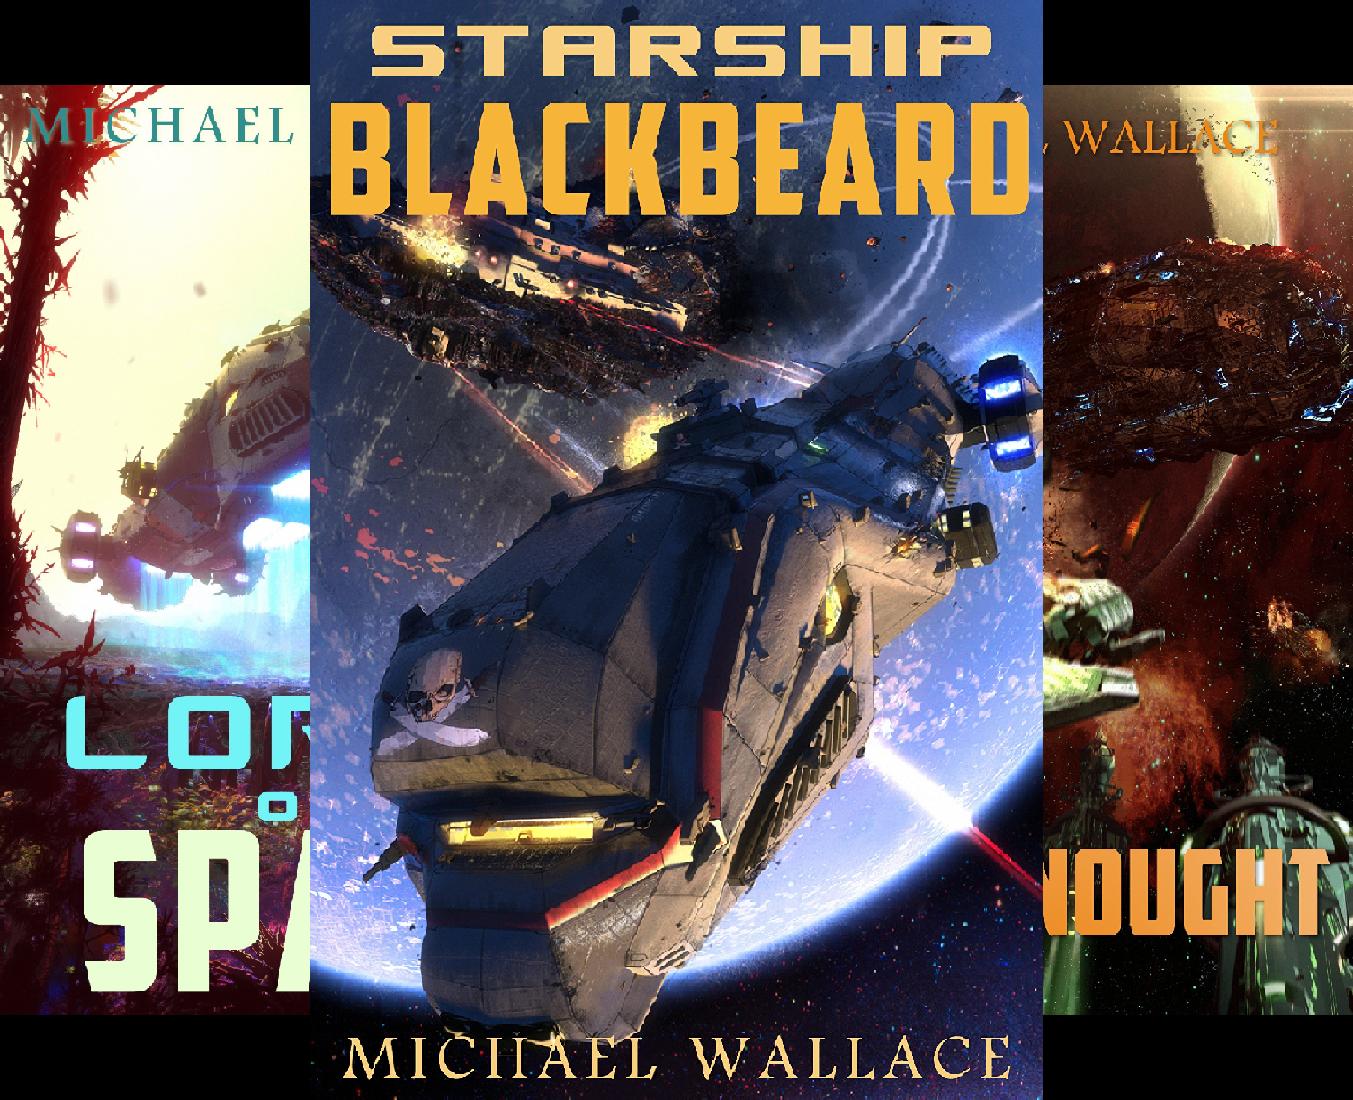 Top 1 starship blackbeard